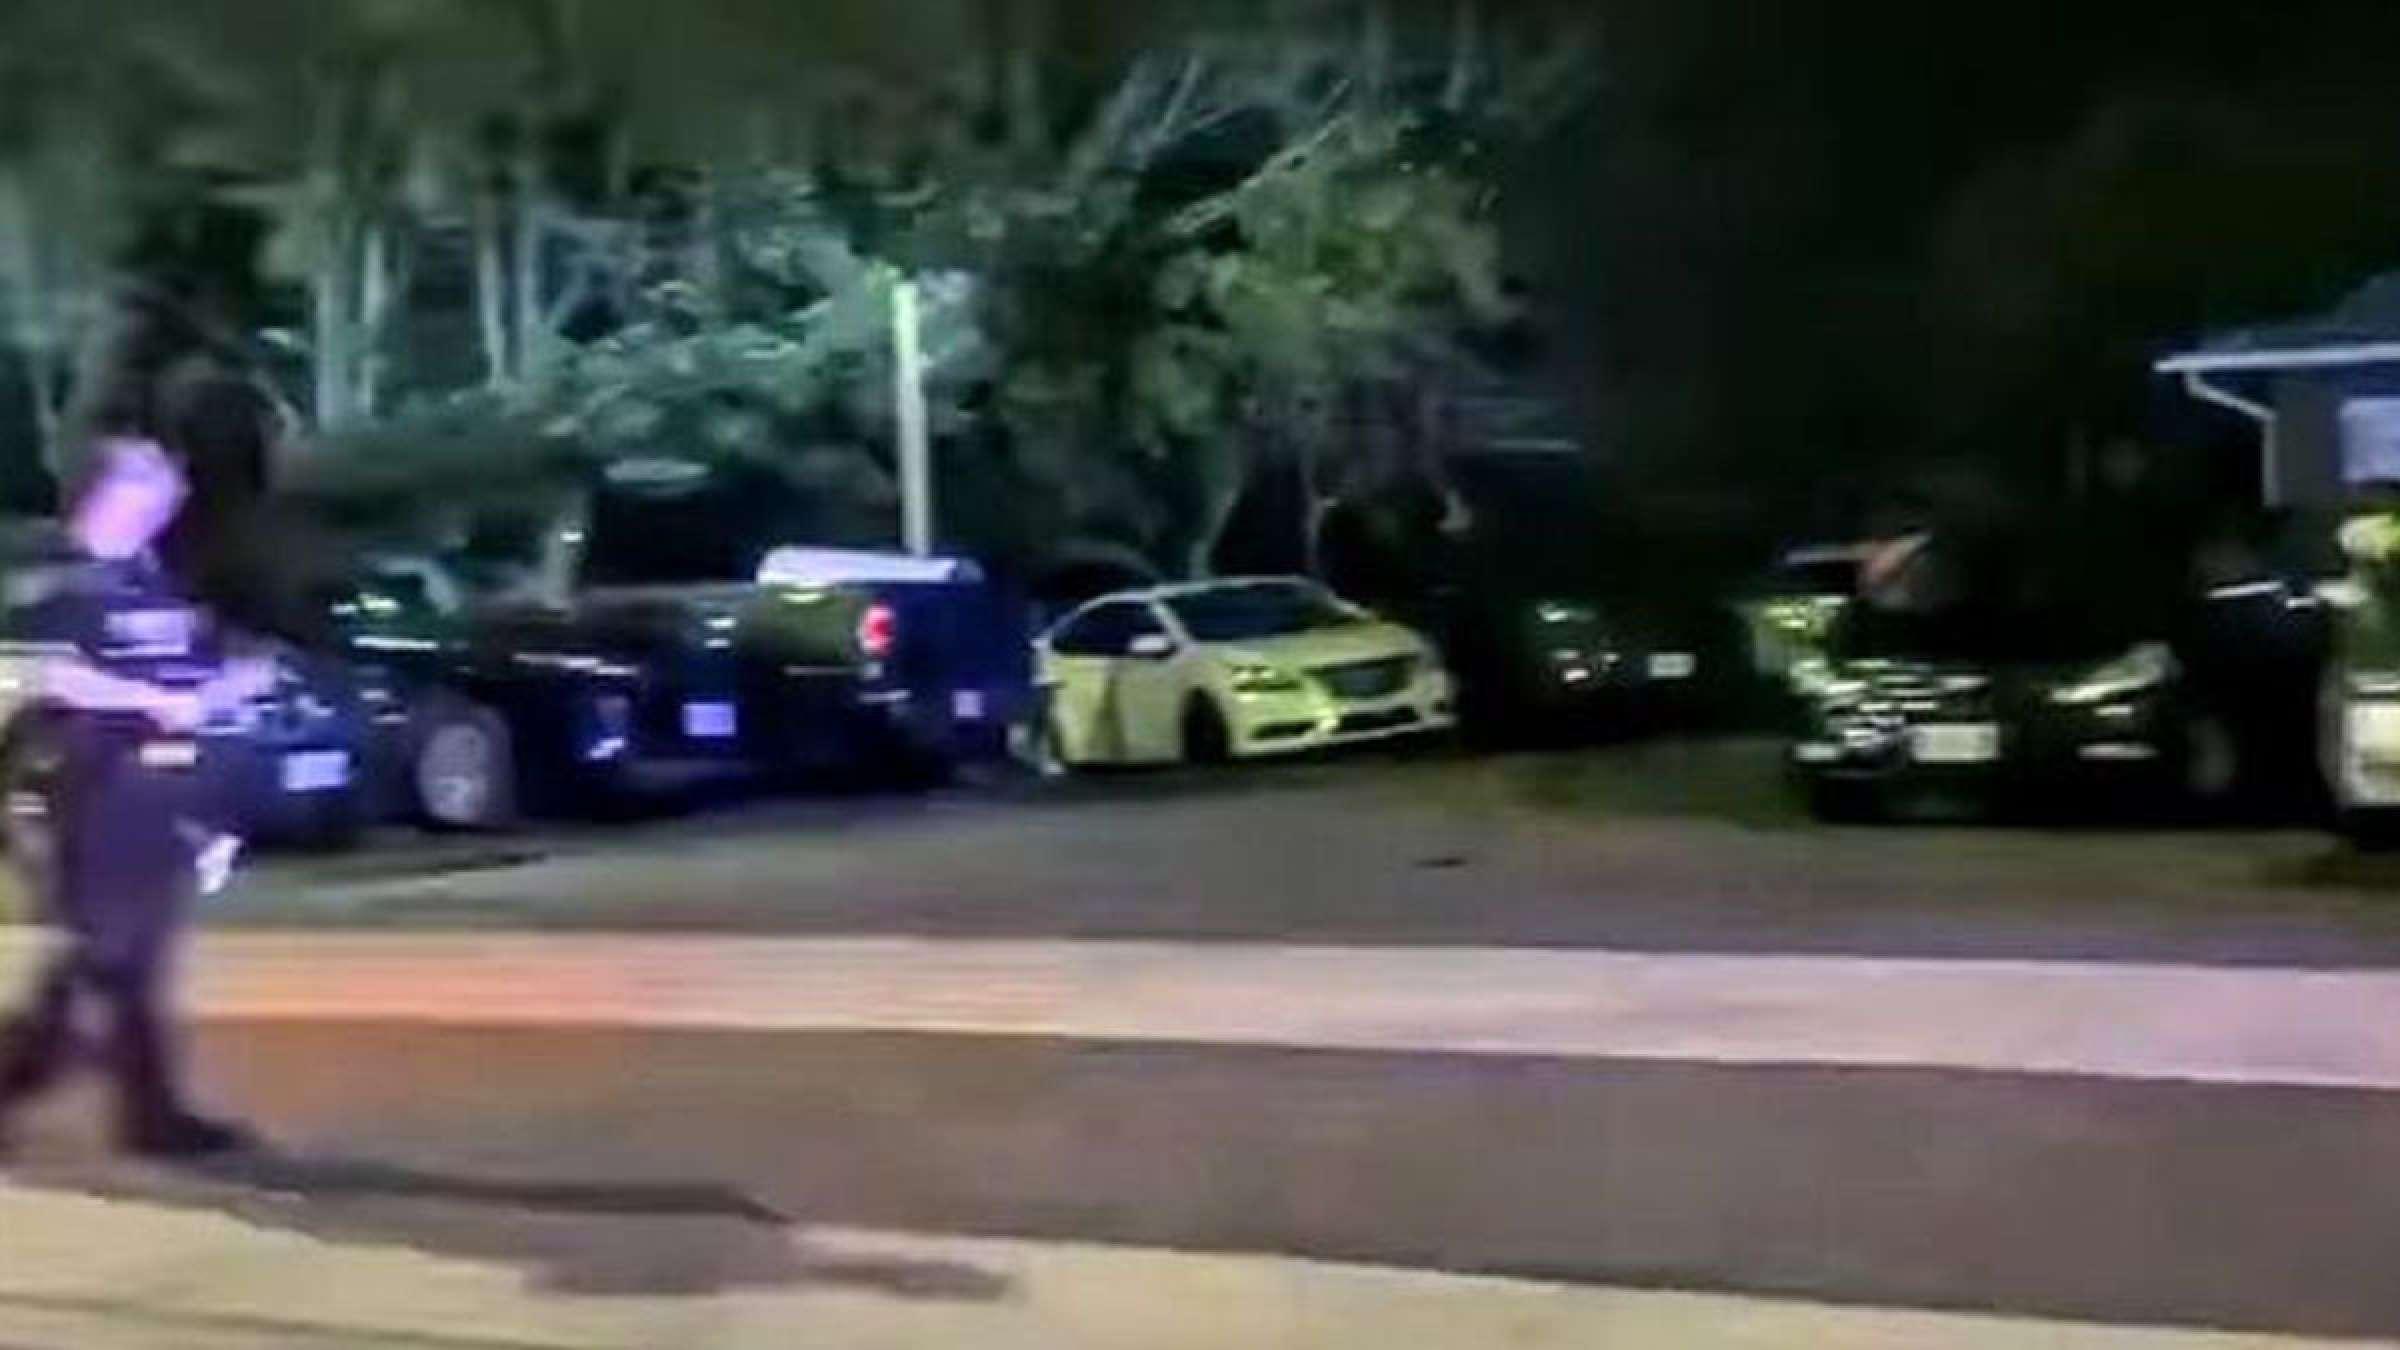 اخبار-تورنتو-حمله-پلیس-به-مهمانی-۲۰۰-نفره-در-برمتون-کانادا